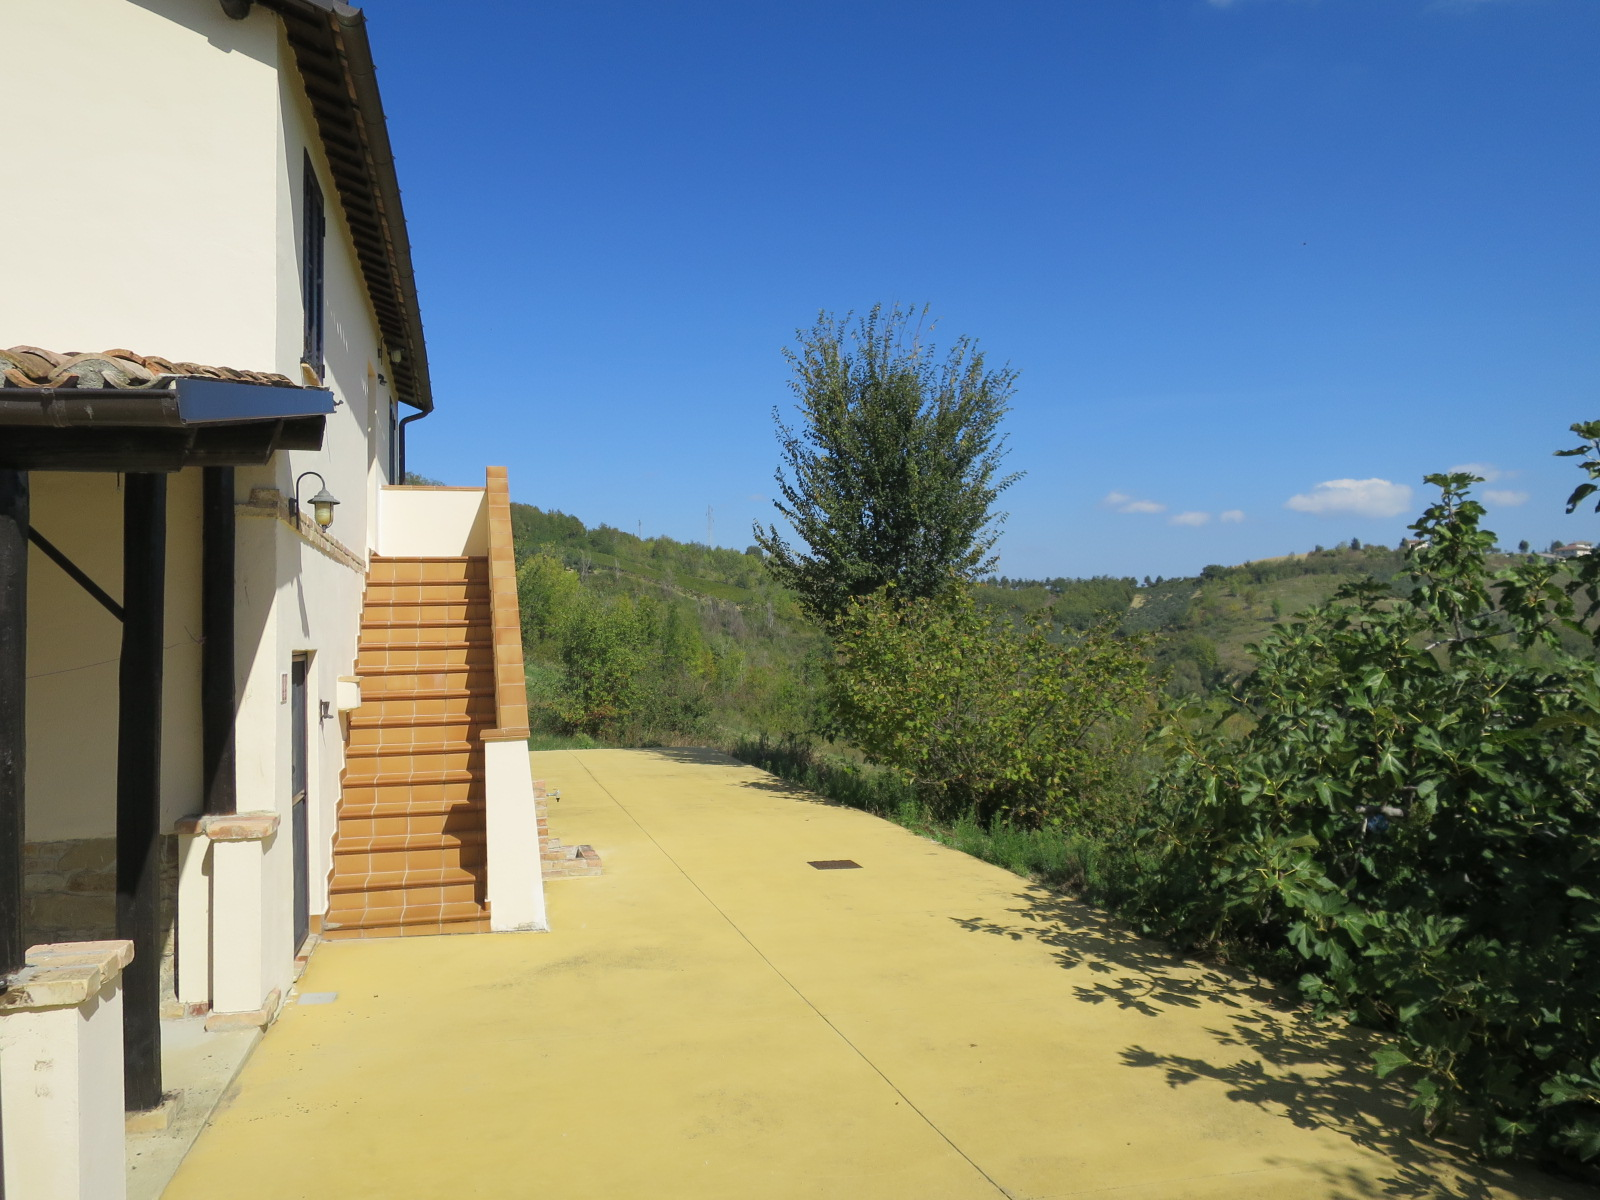 Country Houses Country Houses for sale Montefino (TE), Casa Collina - Montefino - EUR 159.972 270